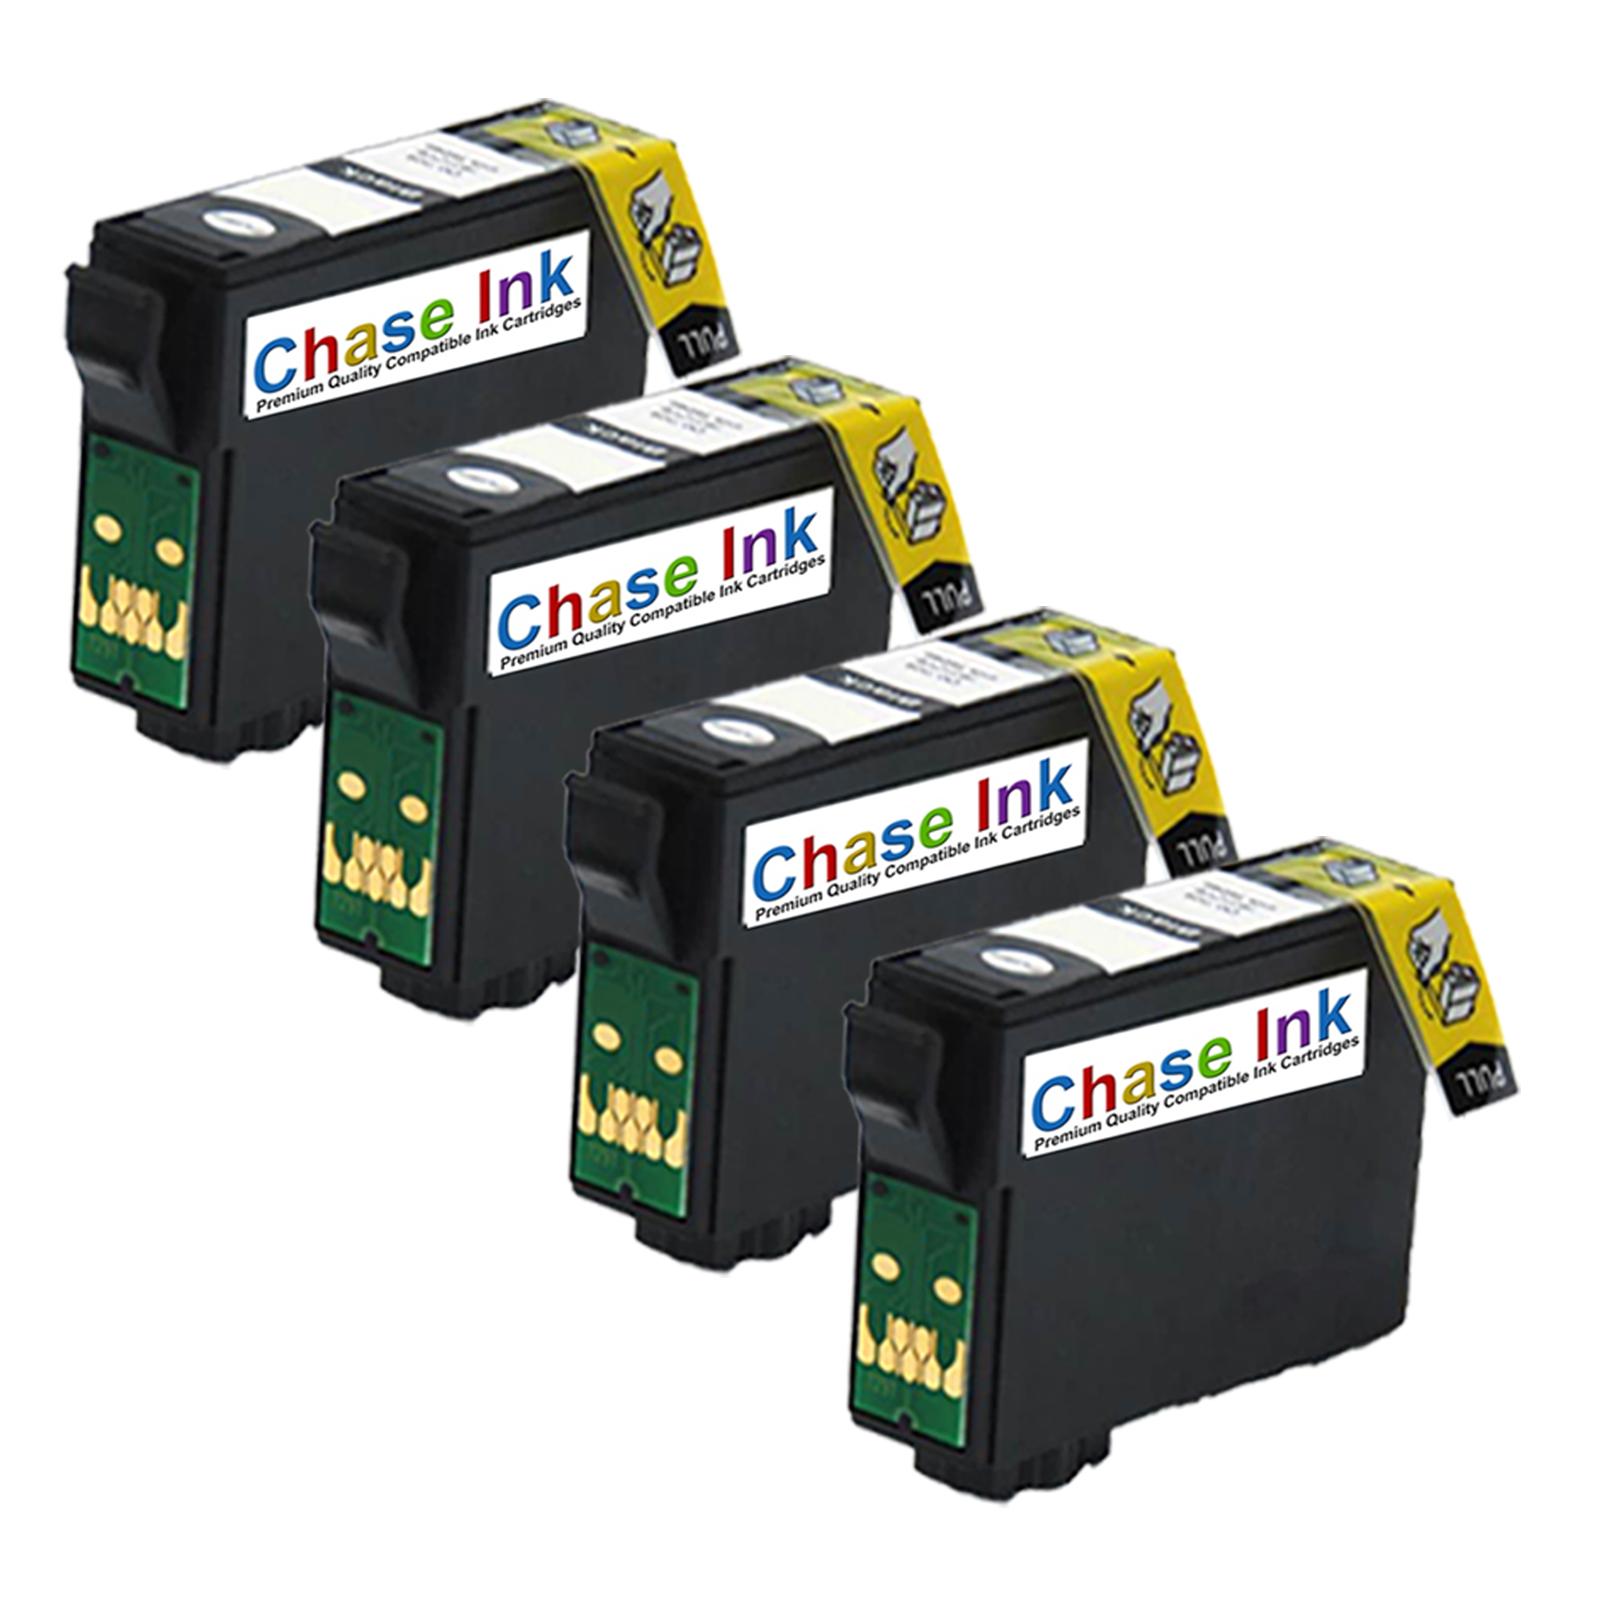 compatible ink cartridges for epson xp 402 xp 405 xp 412 xp 415 xp 422 xp 425 ebay. Black Bedroom Furniture Sets. Home Design Ideas